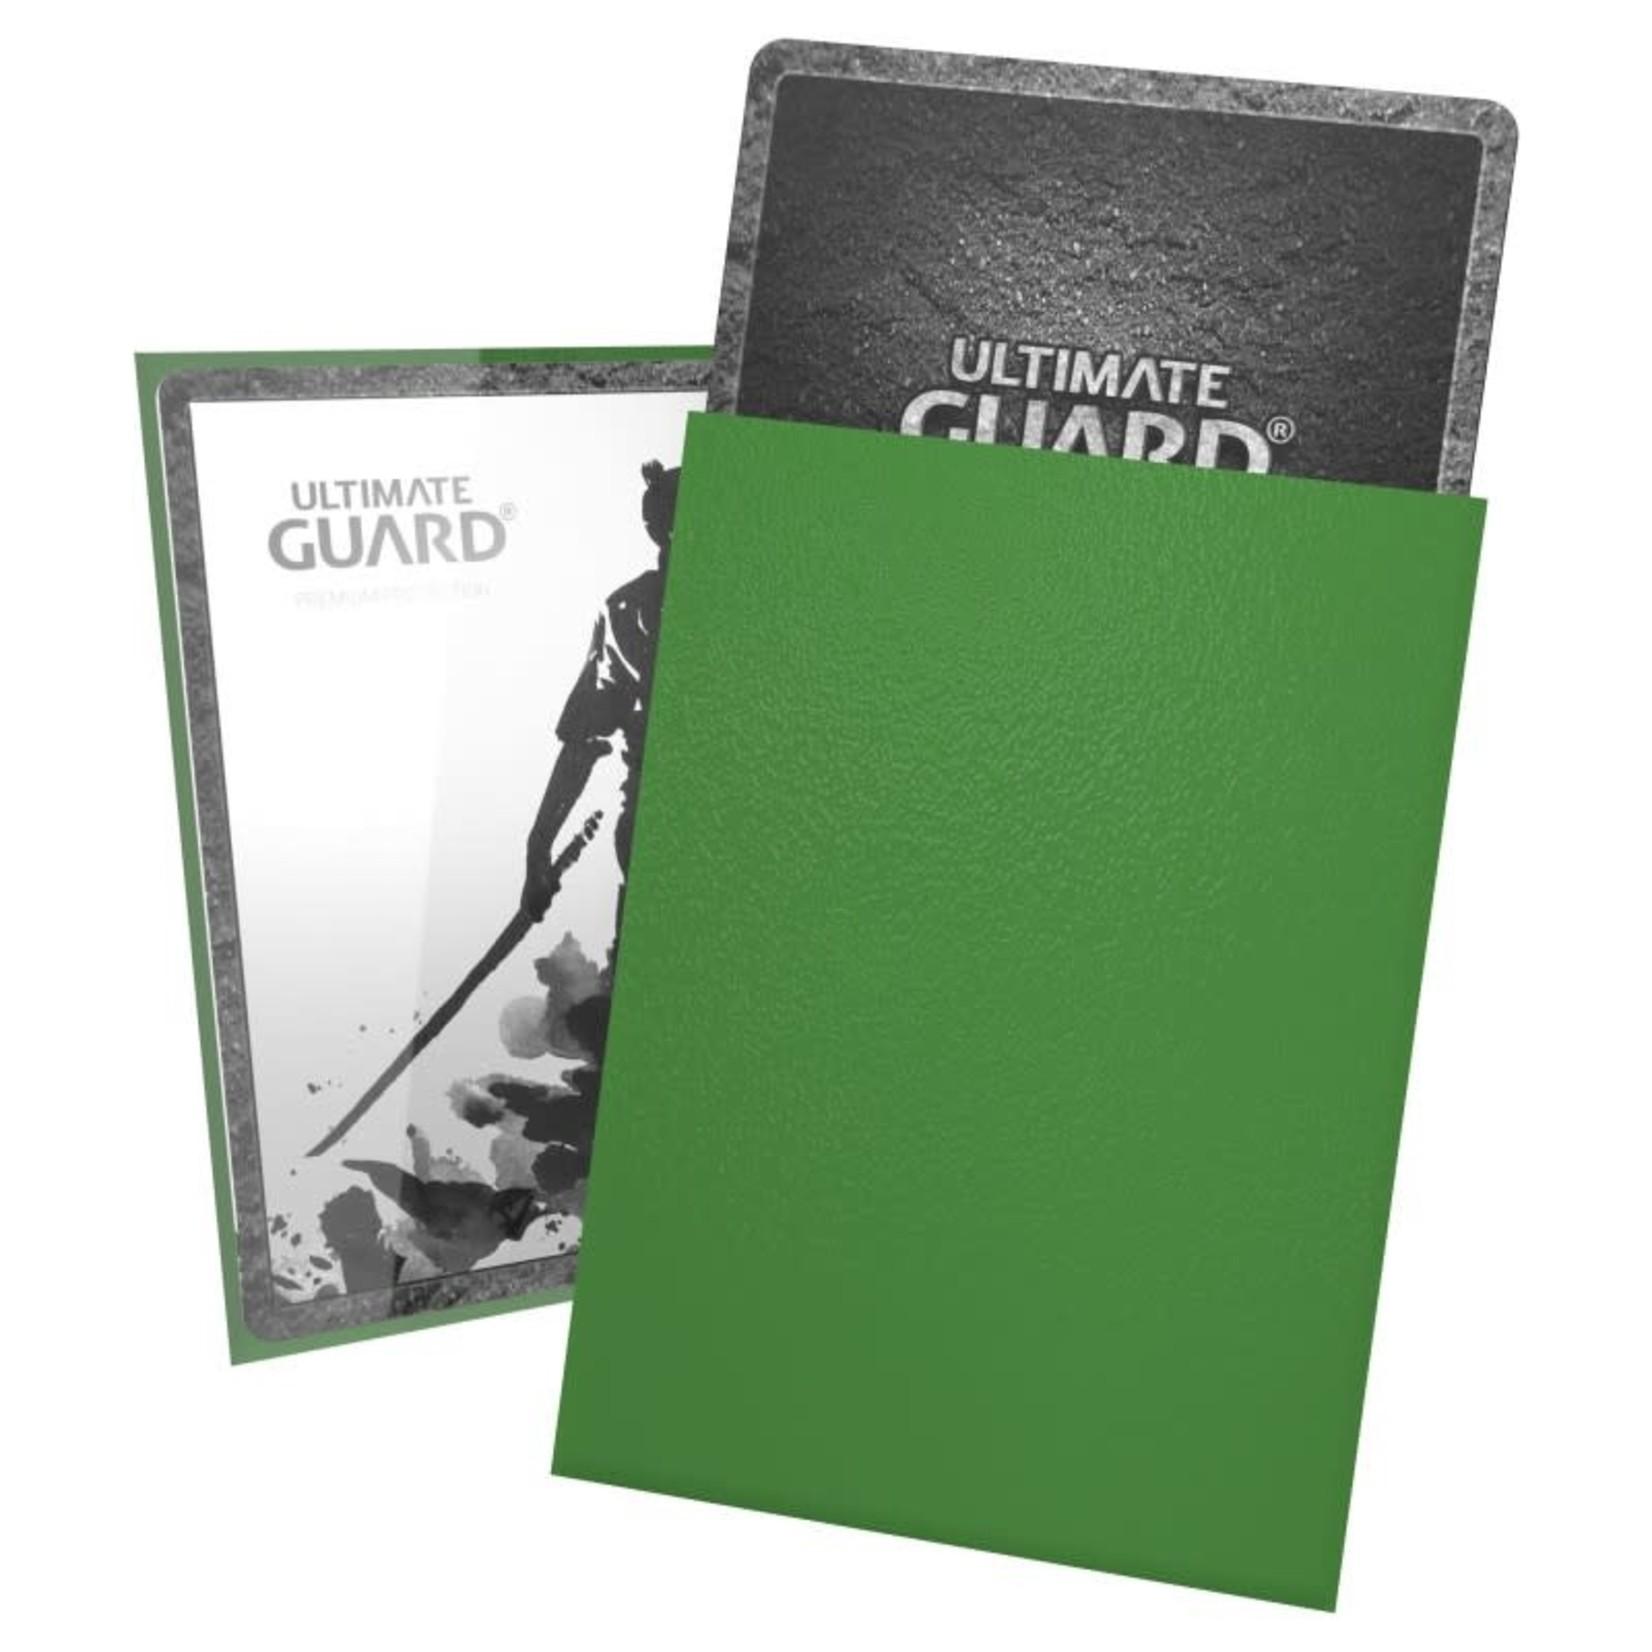 Ultimate Guard Katana Sleeves Green - Ultimate Guard